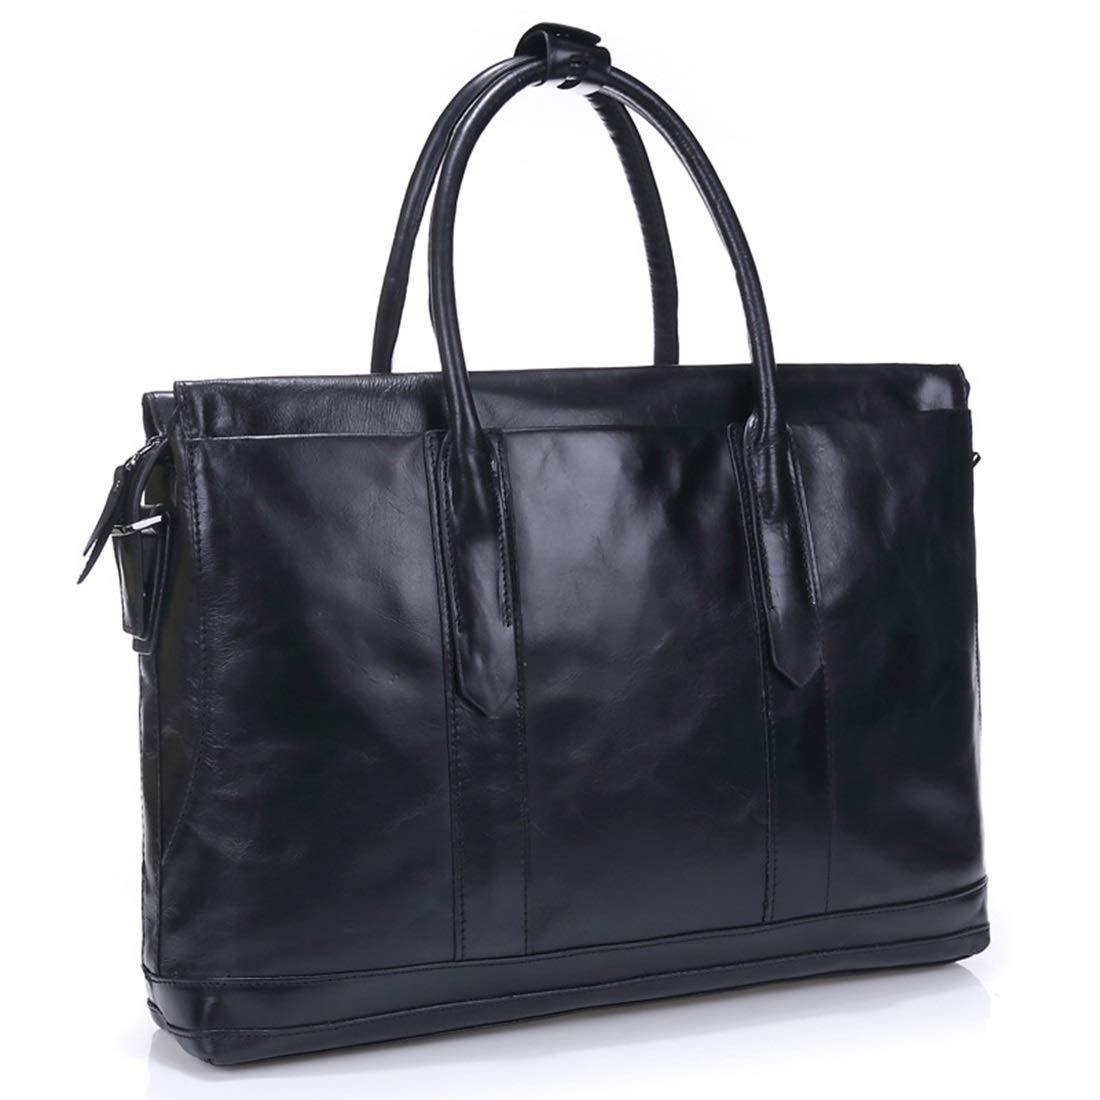 Color : Black RABILTY Mens Leather Hand Bag Travel Bag Leather Business Laptop Bag